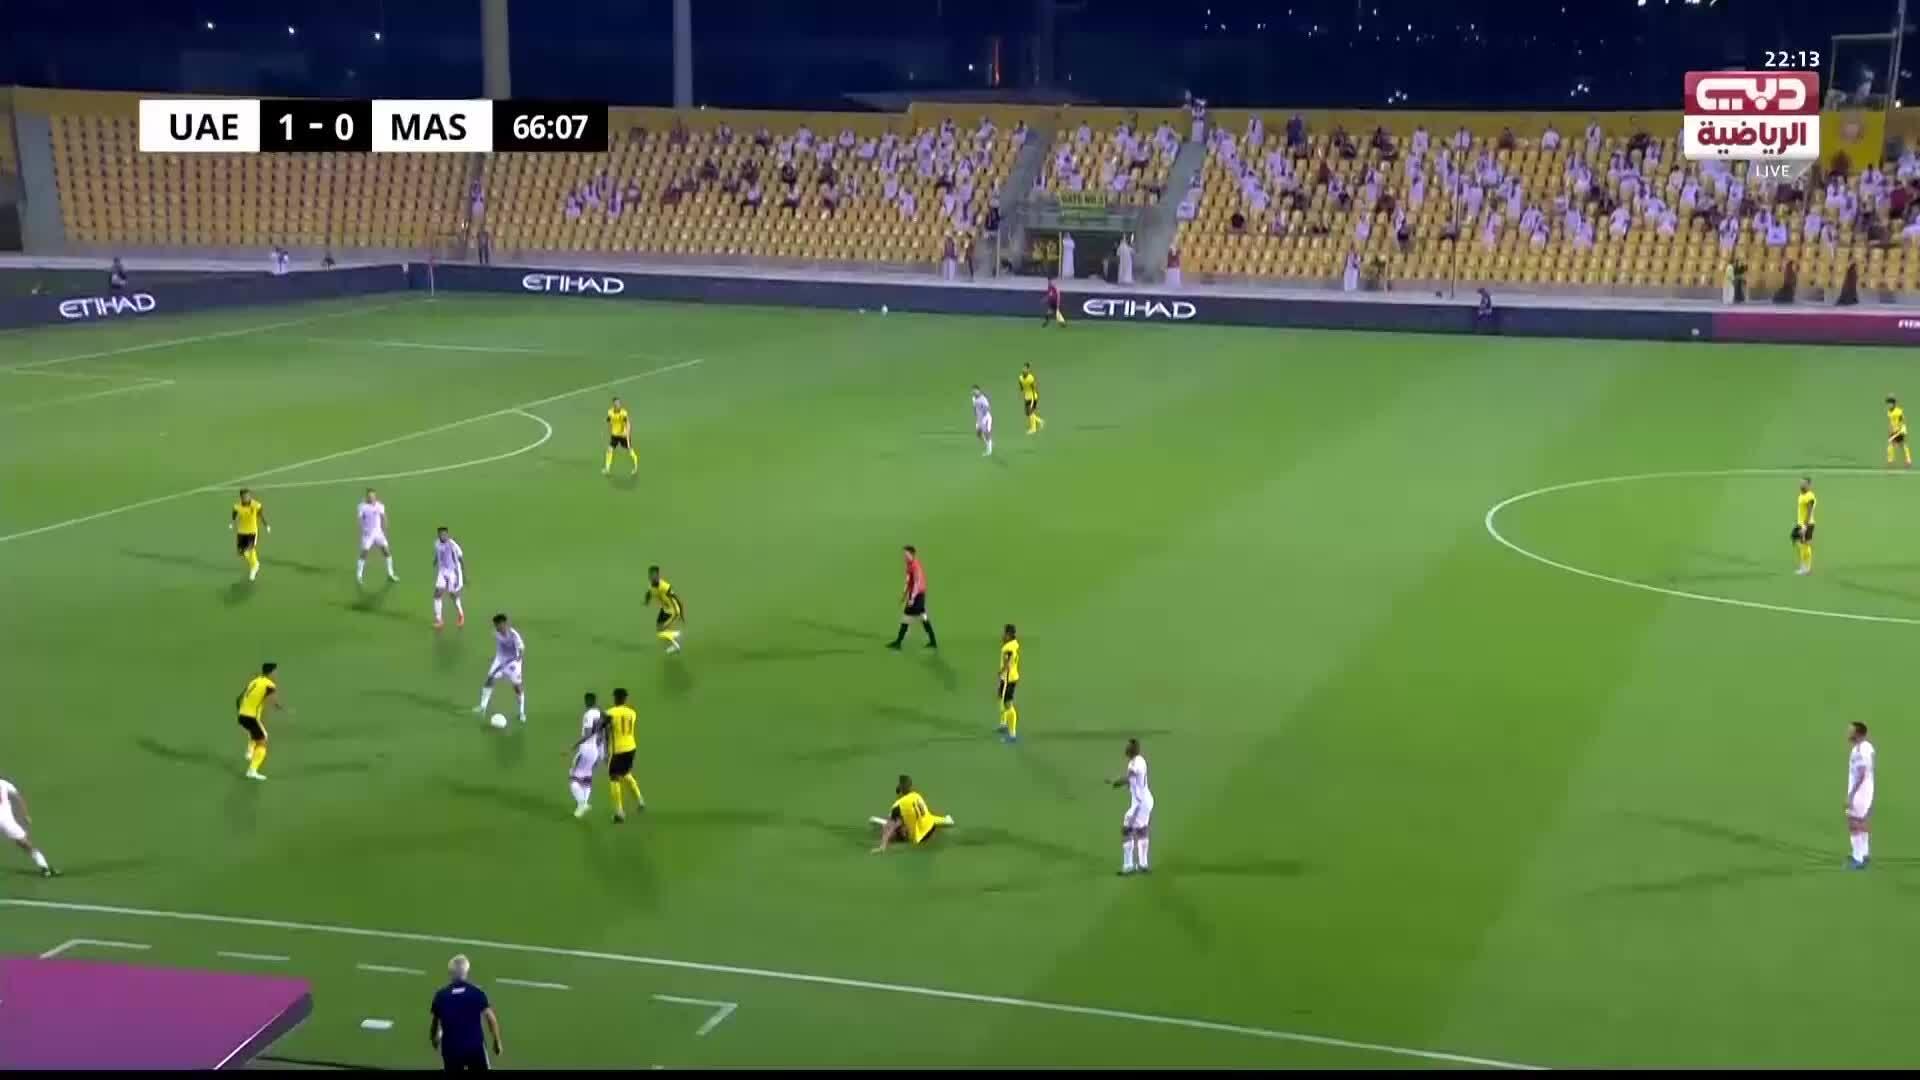 Thủ môn Malaysia cứu thua